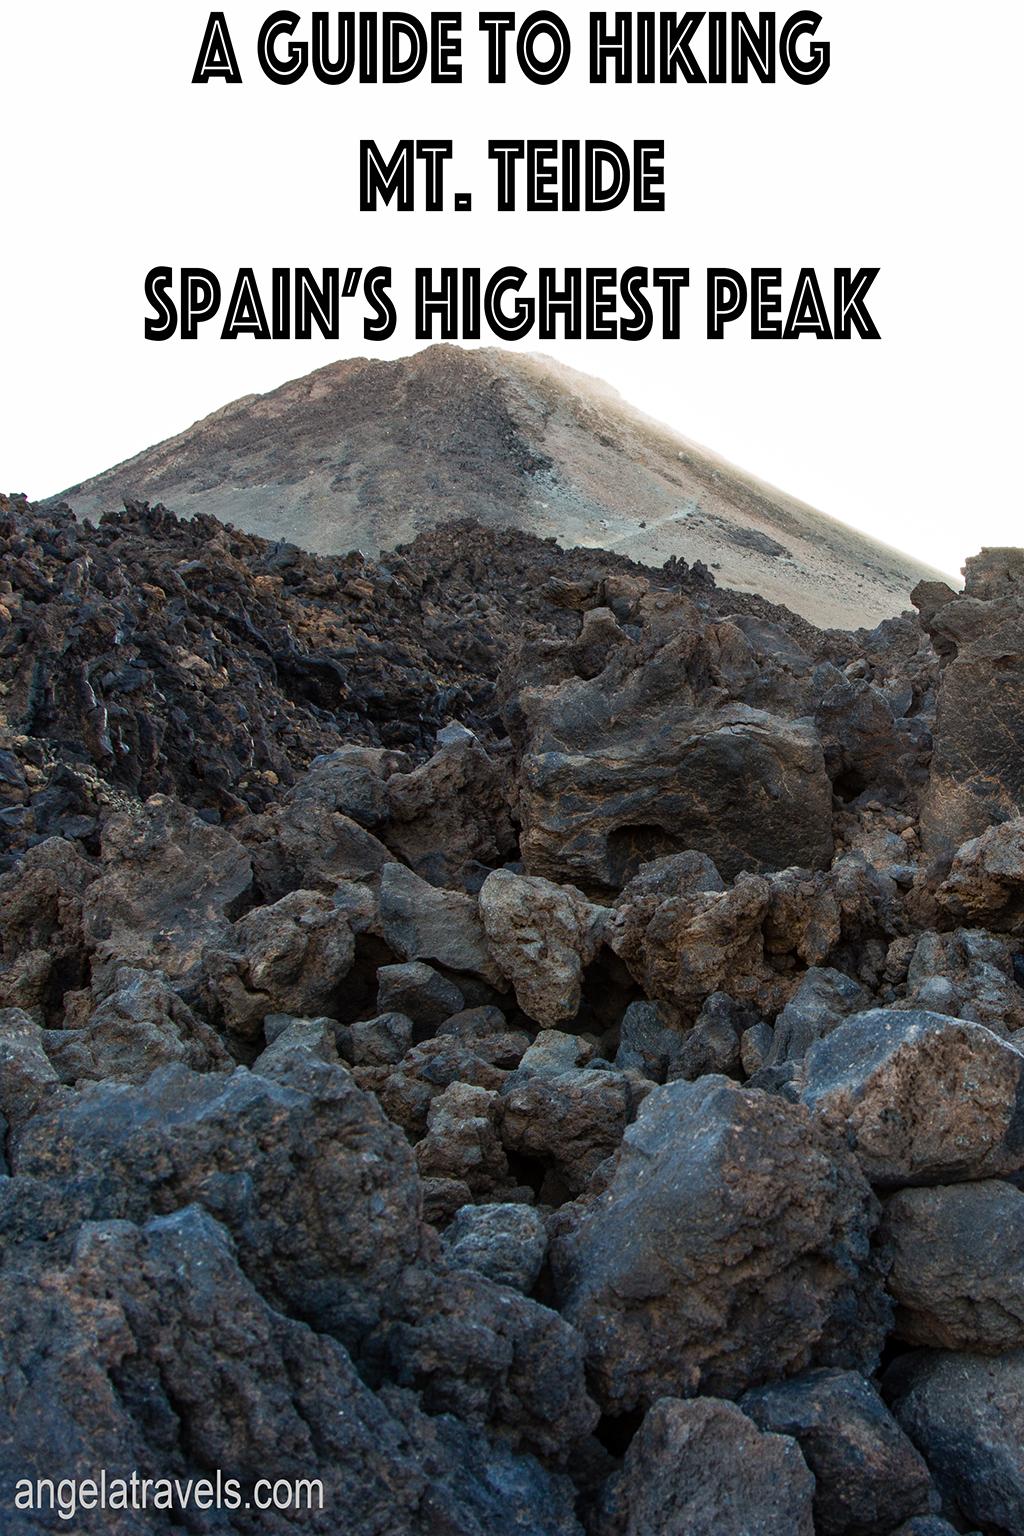 A Hiking Guide to Mt. Teide: Spain's Highest Peak